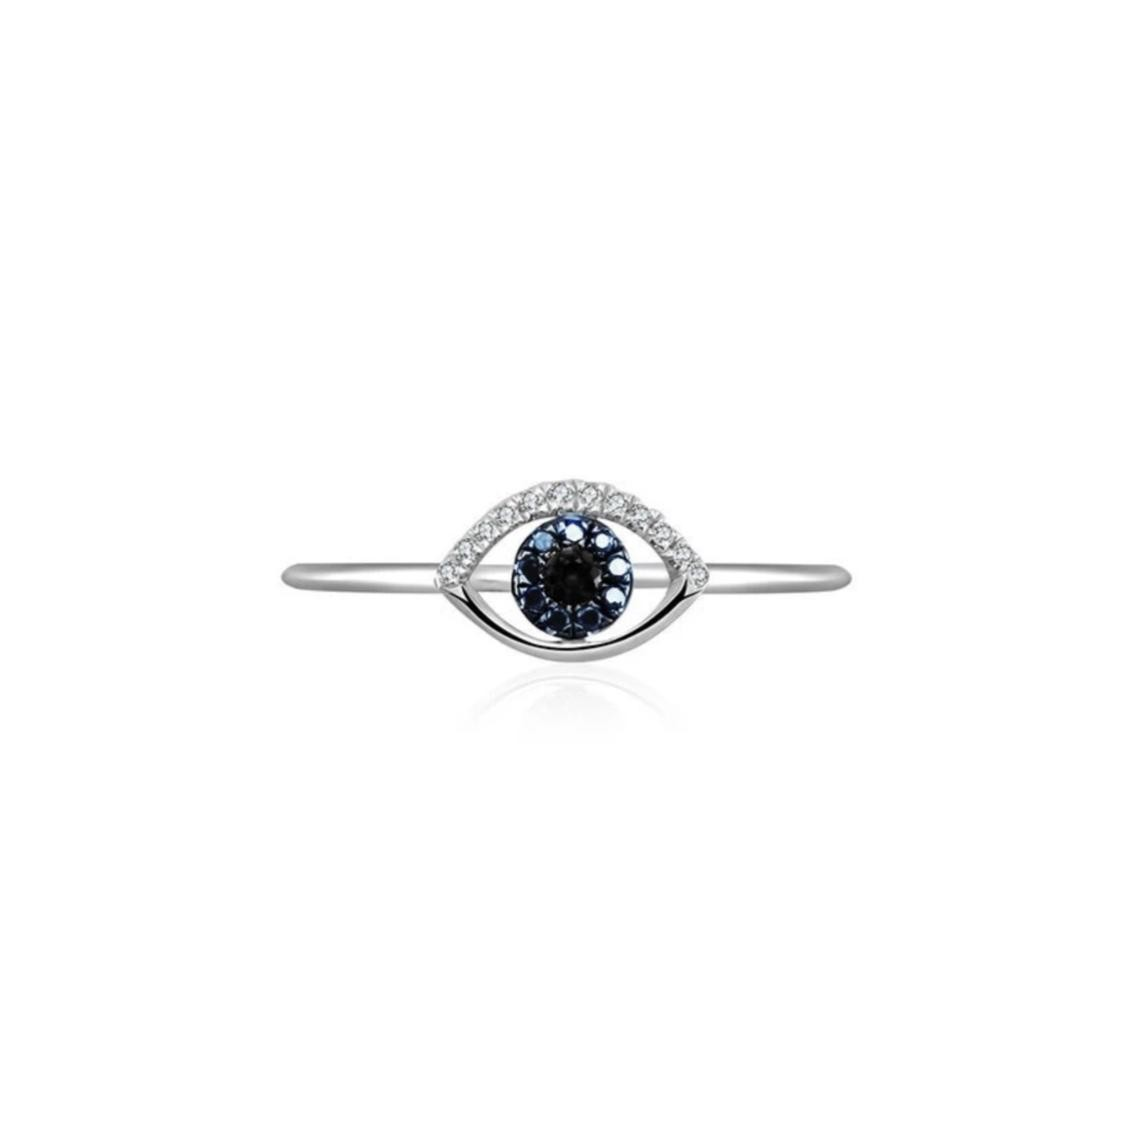 Anel Olho Grego Ouro Branco 18k, Safiras e Diamantes